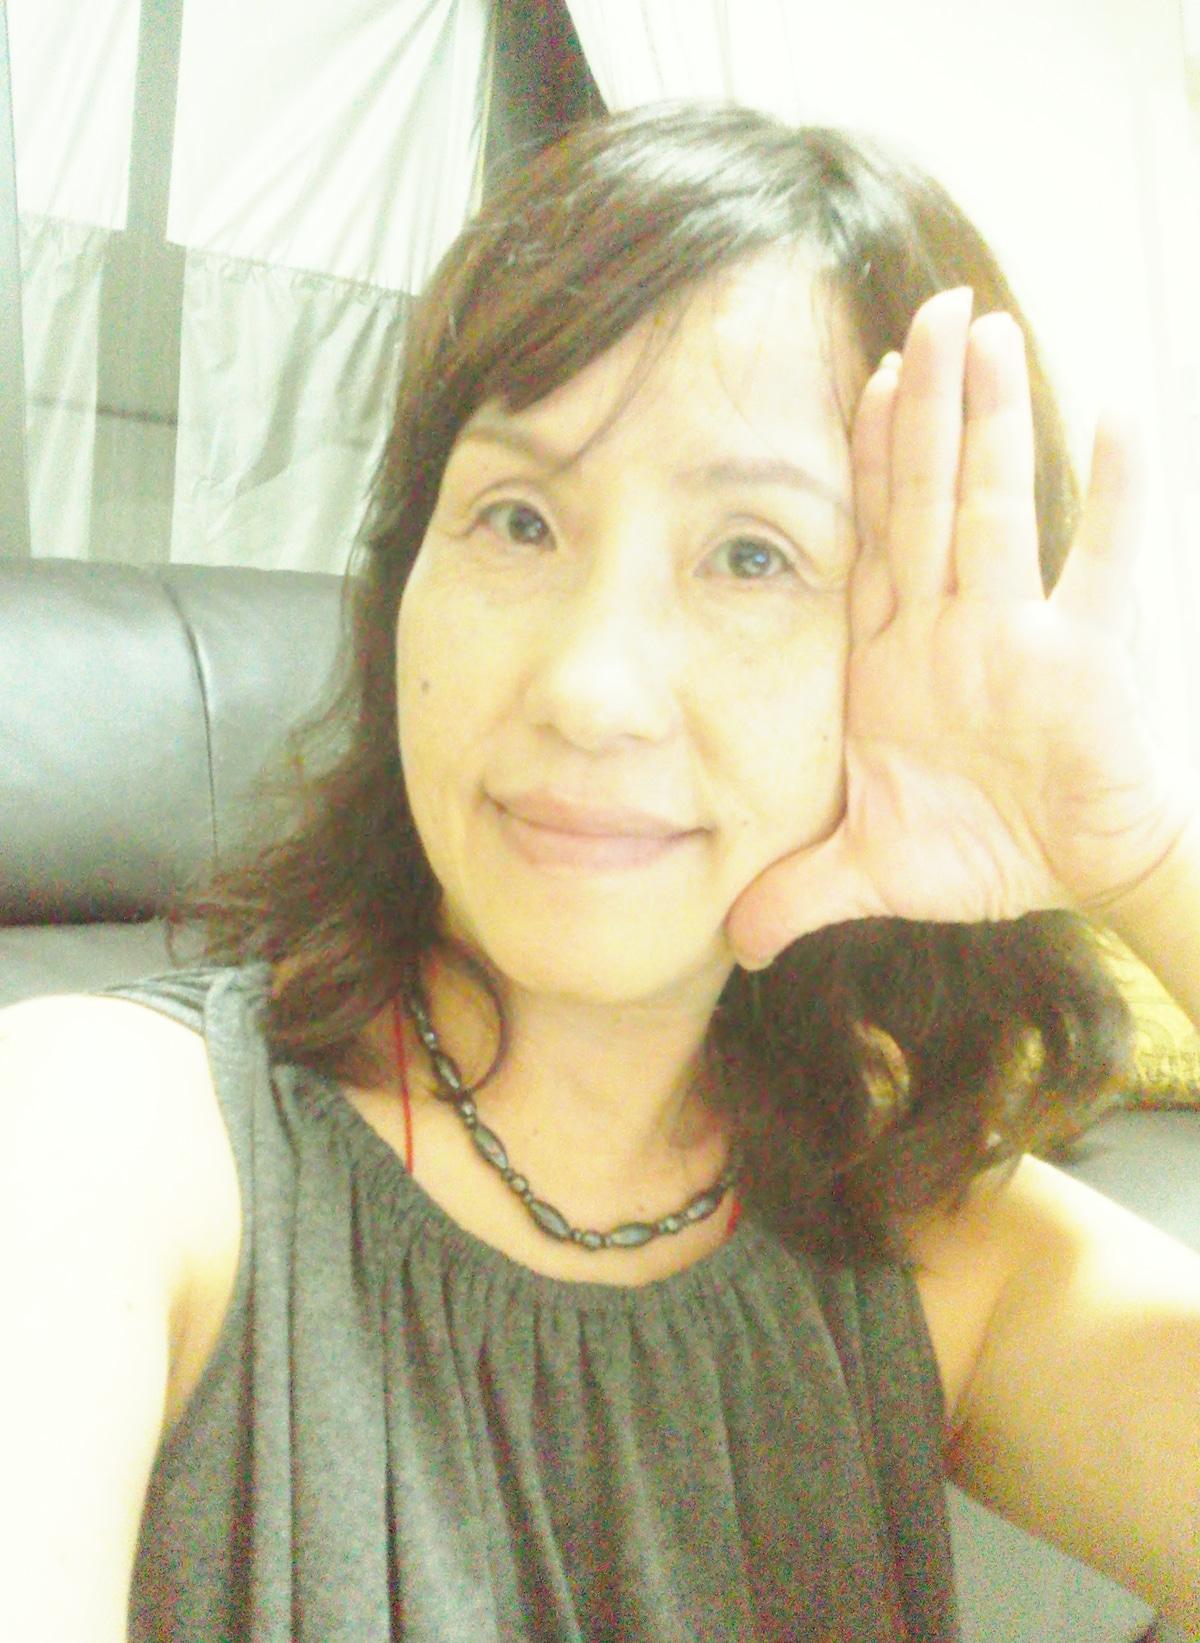 Keiko From Ena, Japan